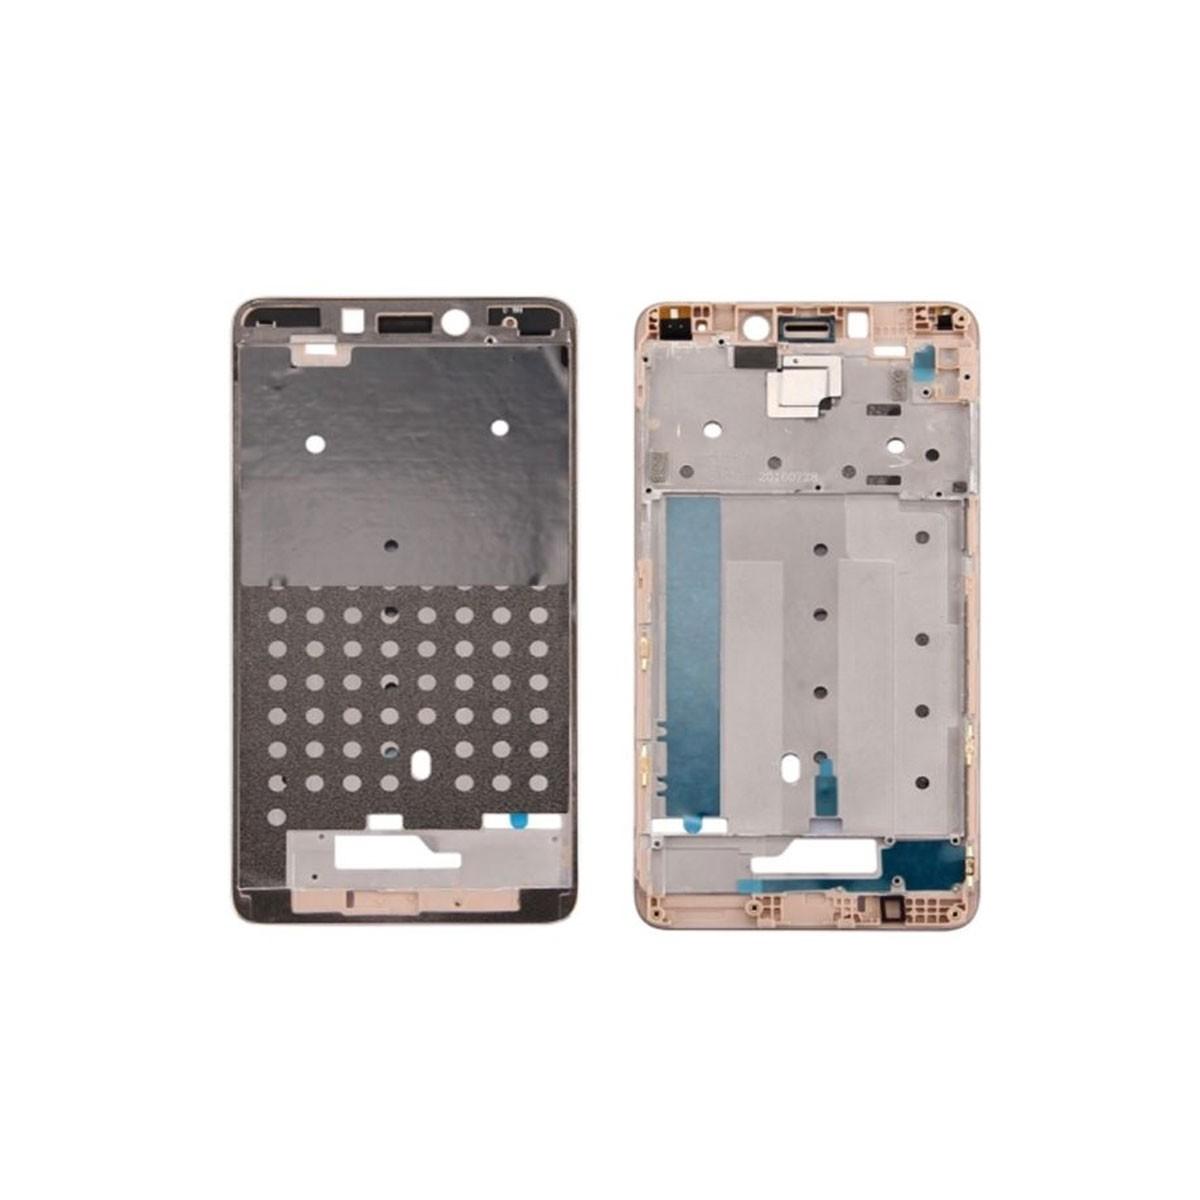 Carcasa intermedia Xiaomi Redmi note 4 Blanca